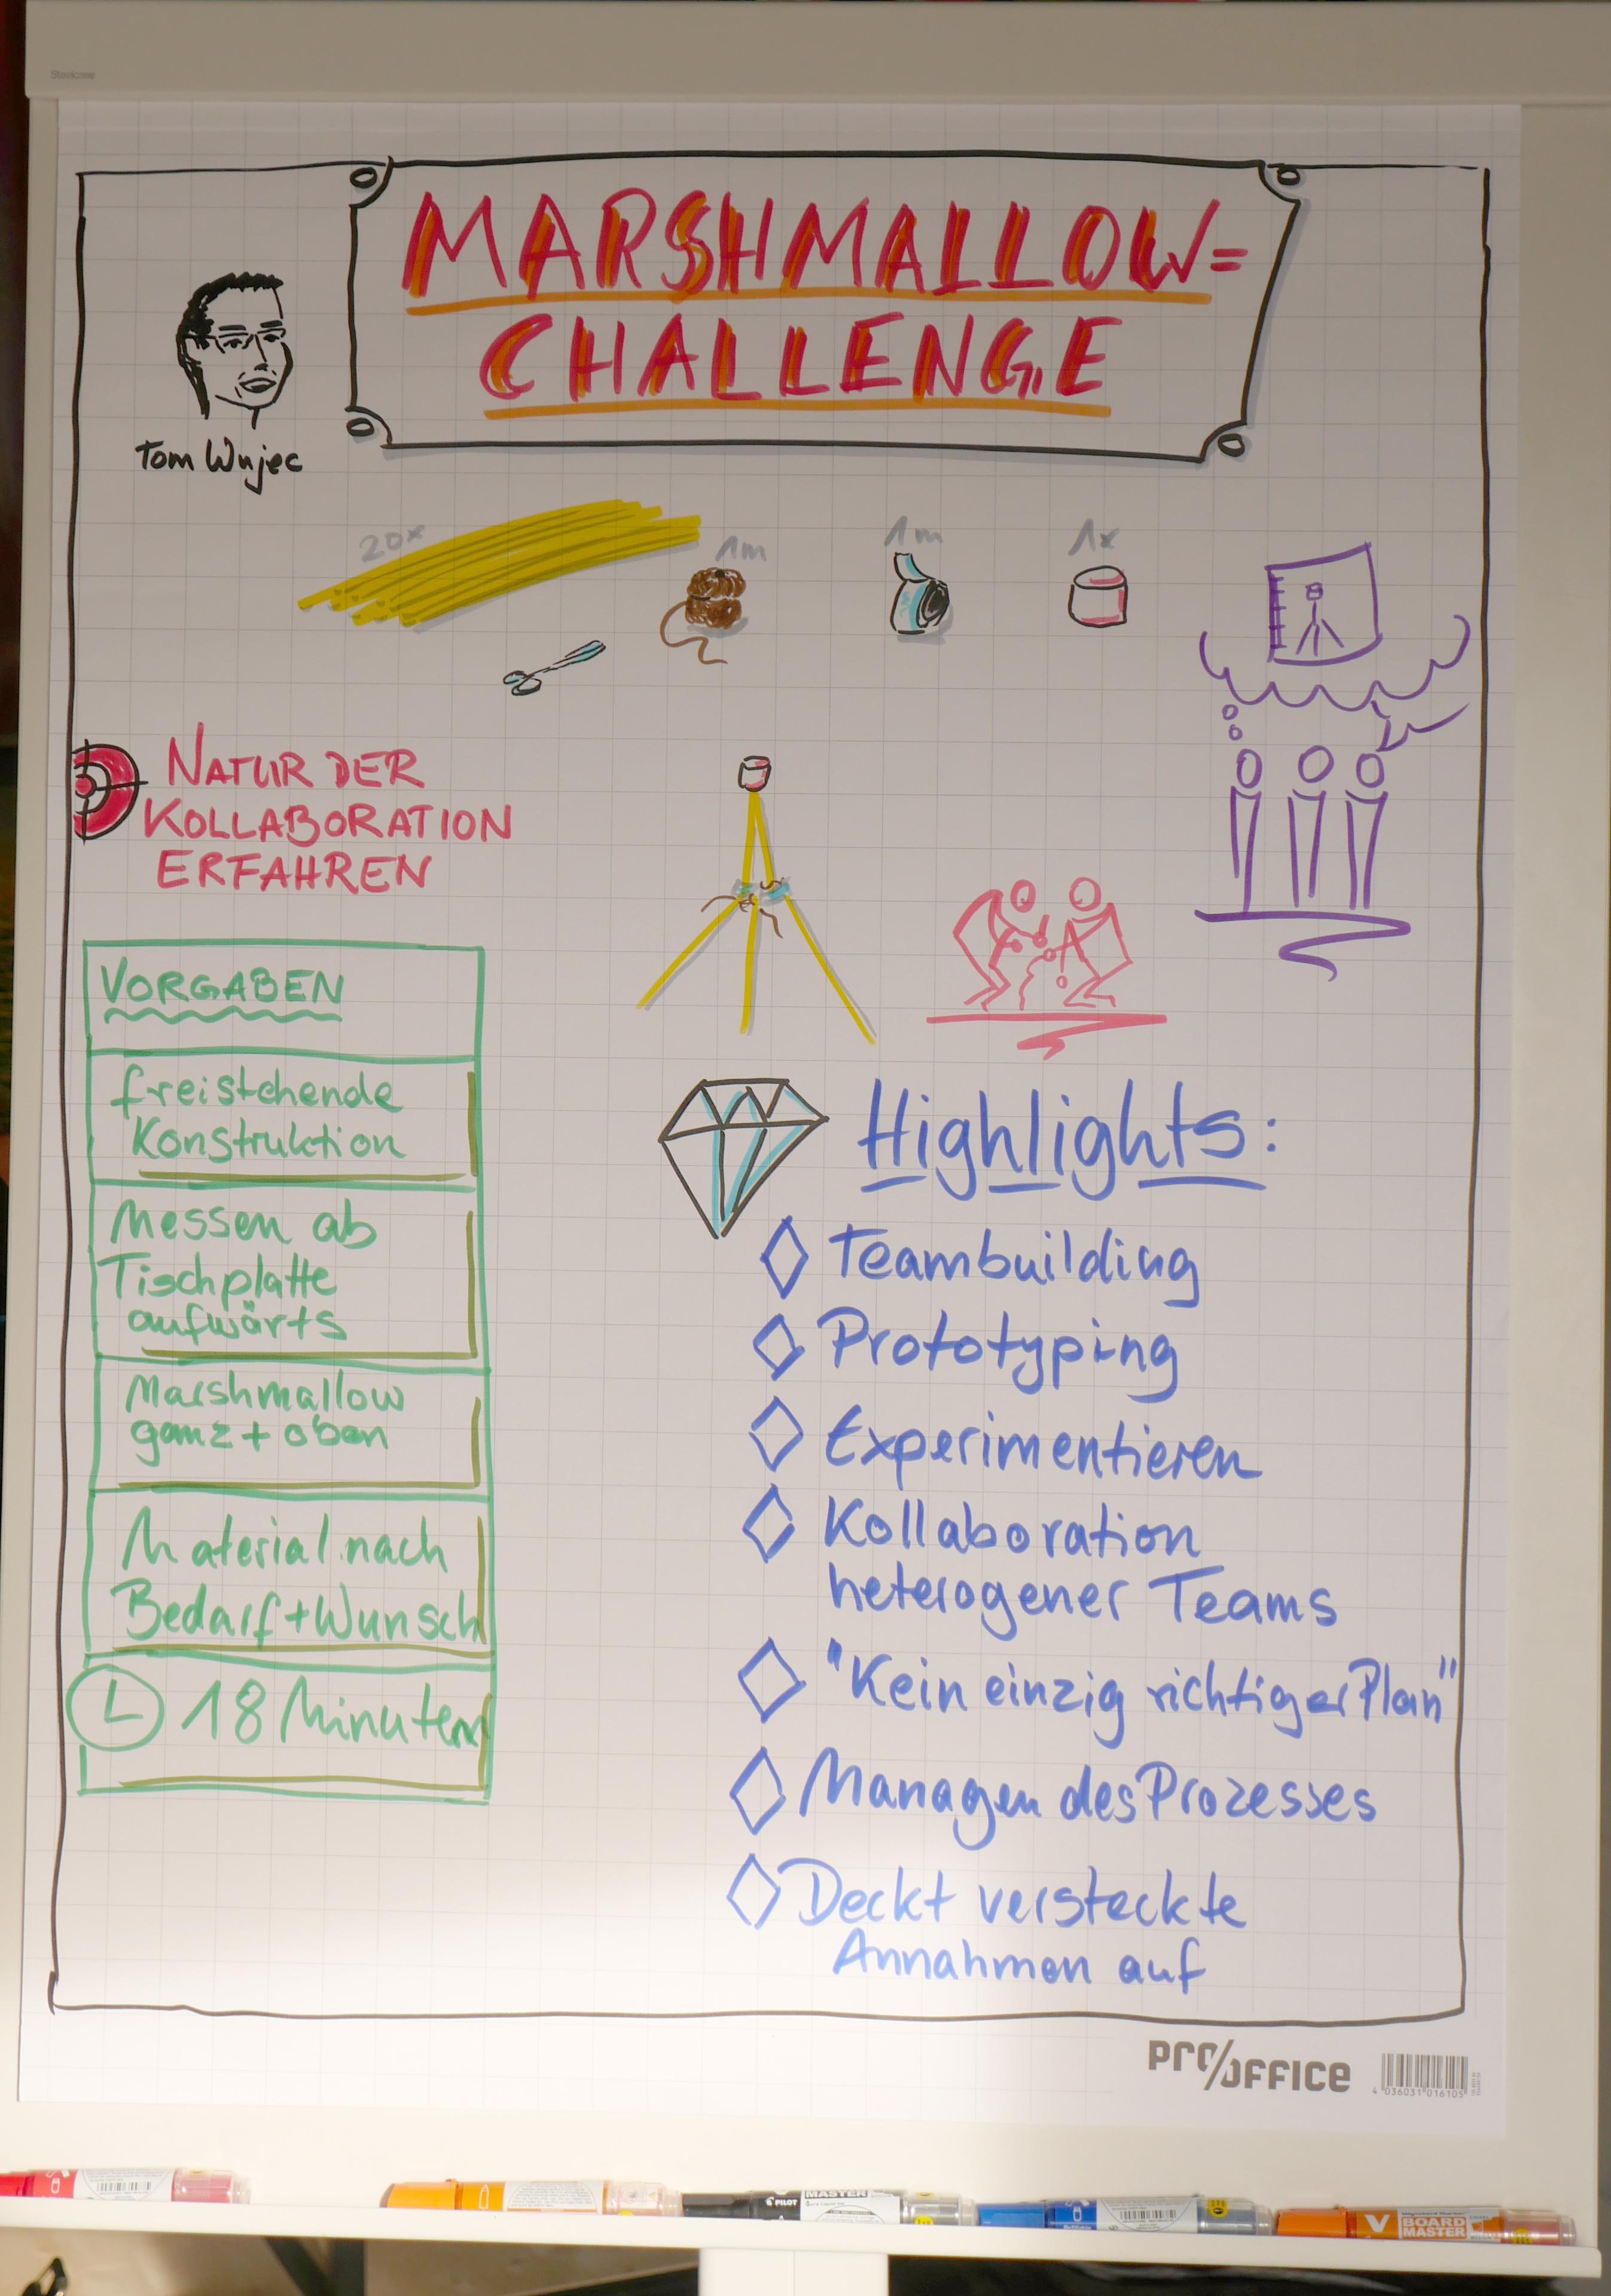 Agile Spiele marshmallow-challenge – agile business games